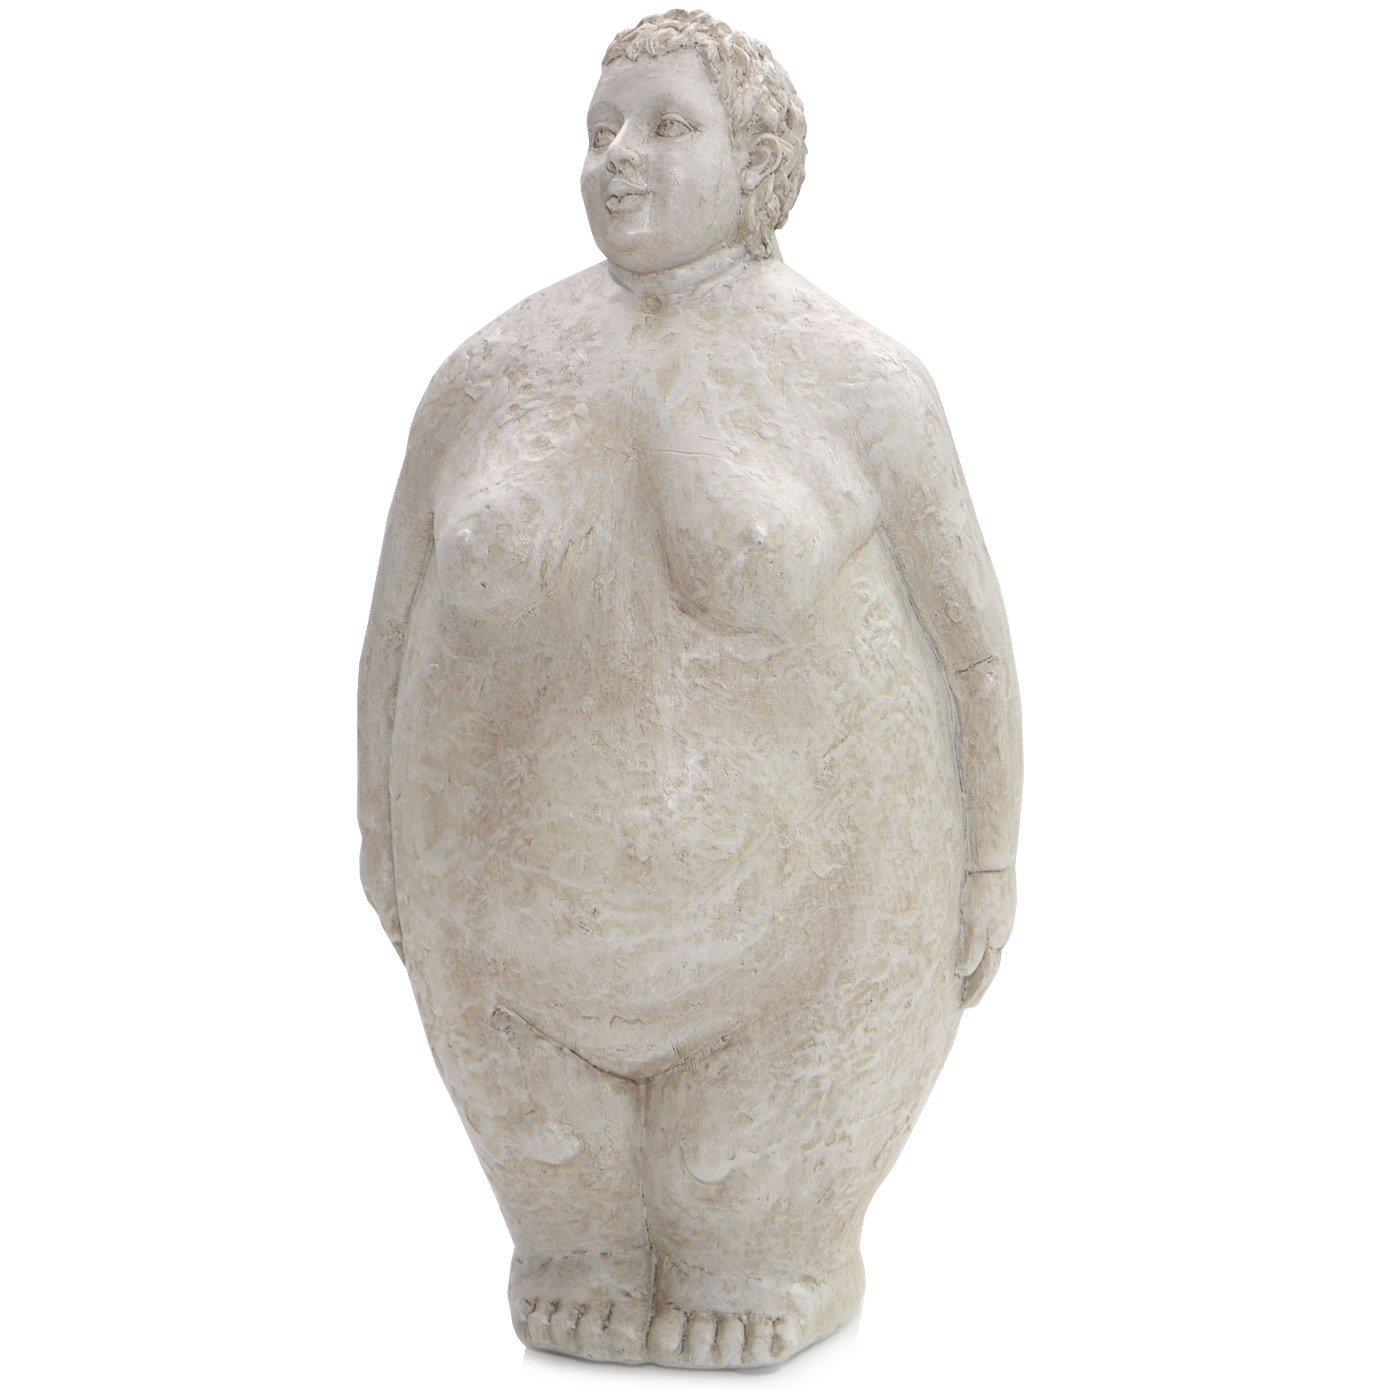 Frauen Skulptur ° HILDA° Dicke Dame in Steinoptik ° Garten Figur ° Deko H 61 cm